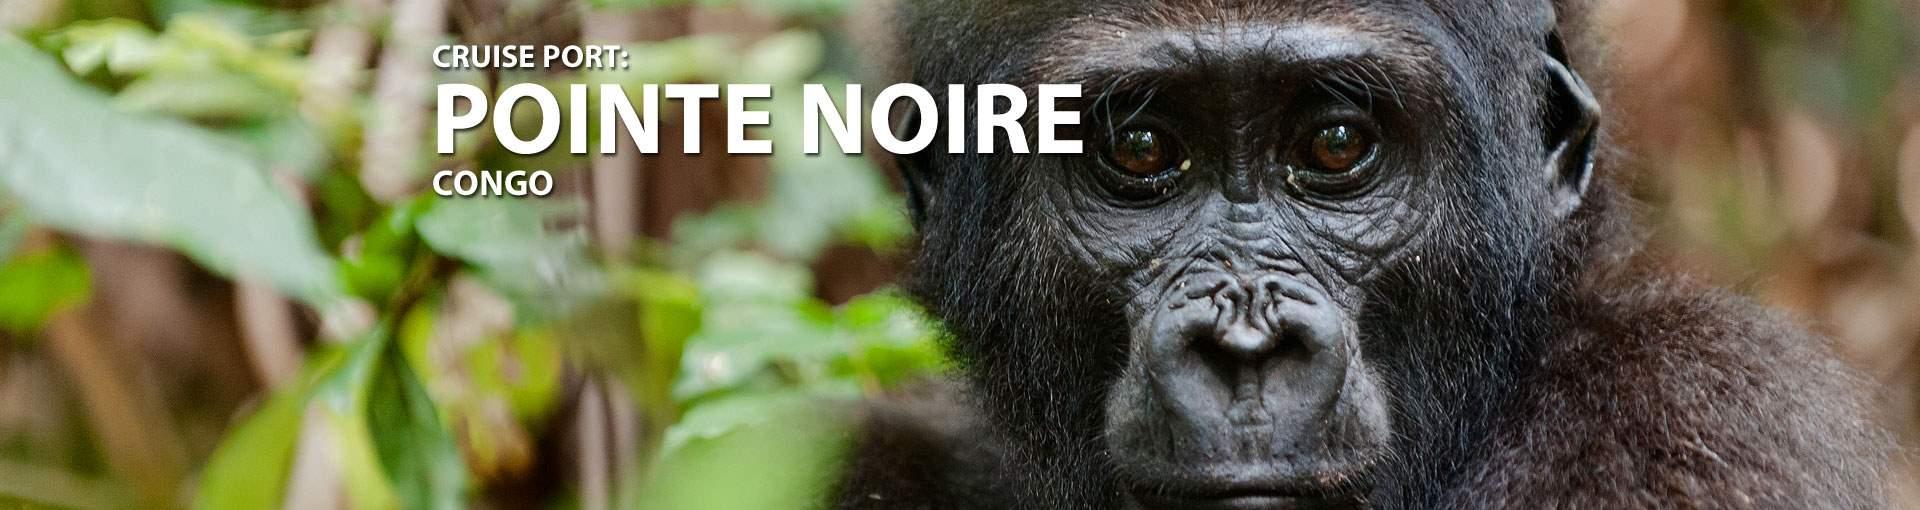 Cruises to Pointe Noire, Congo